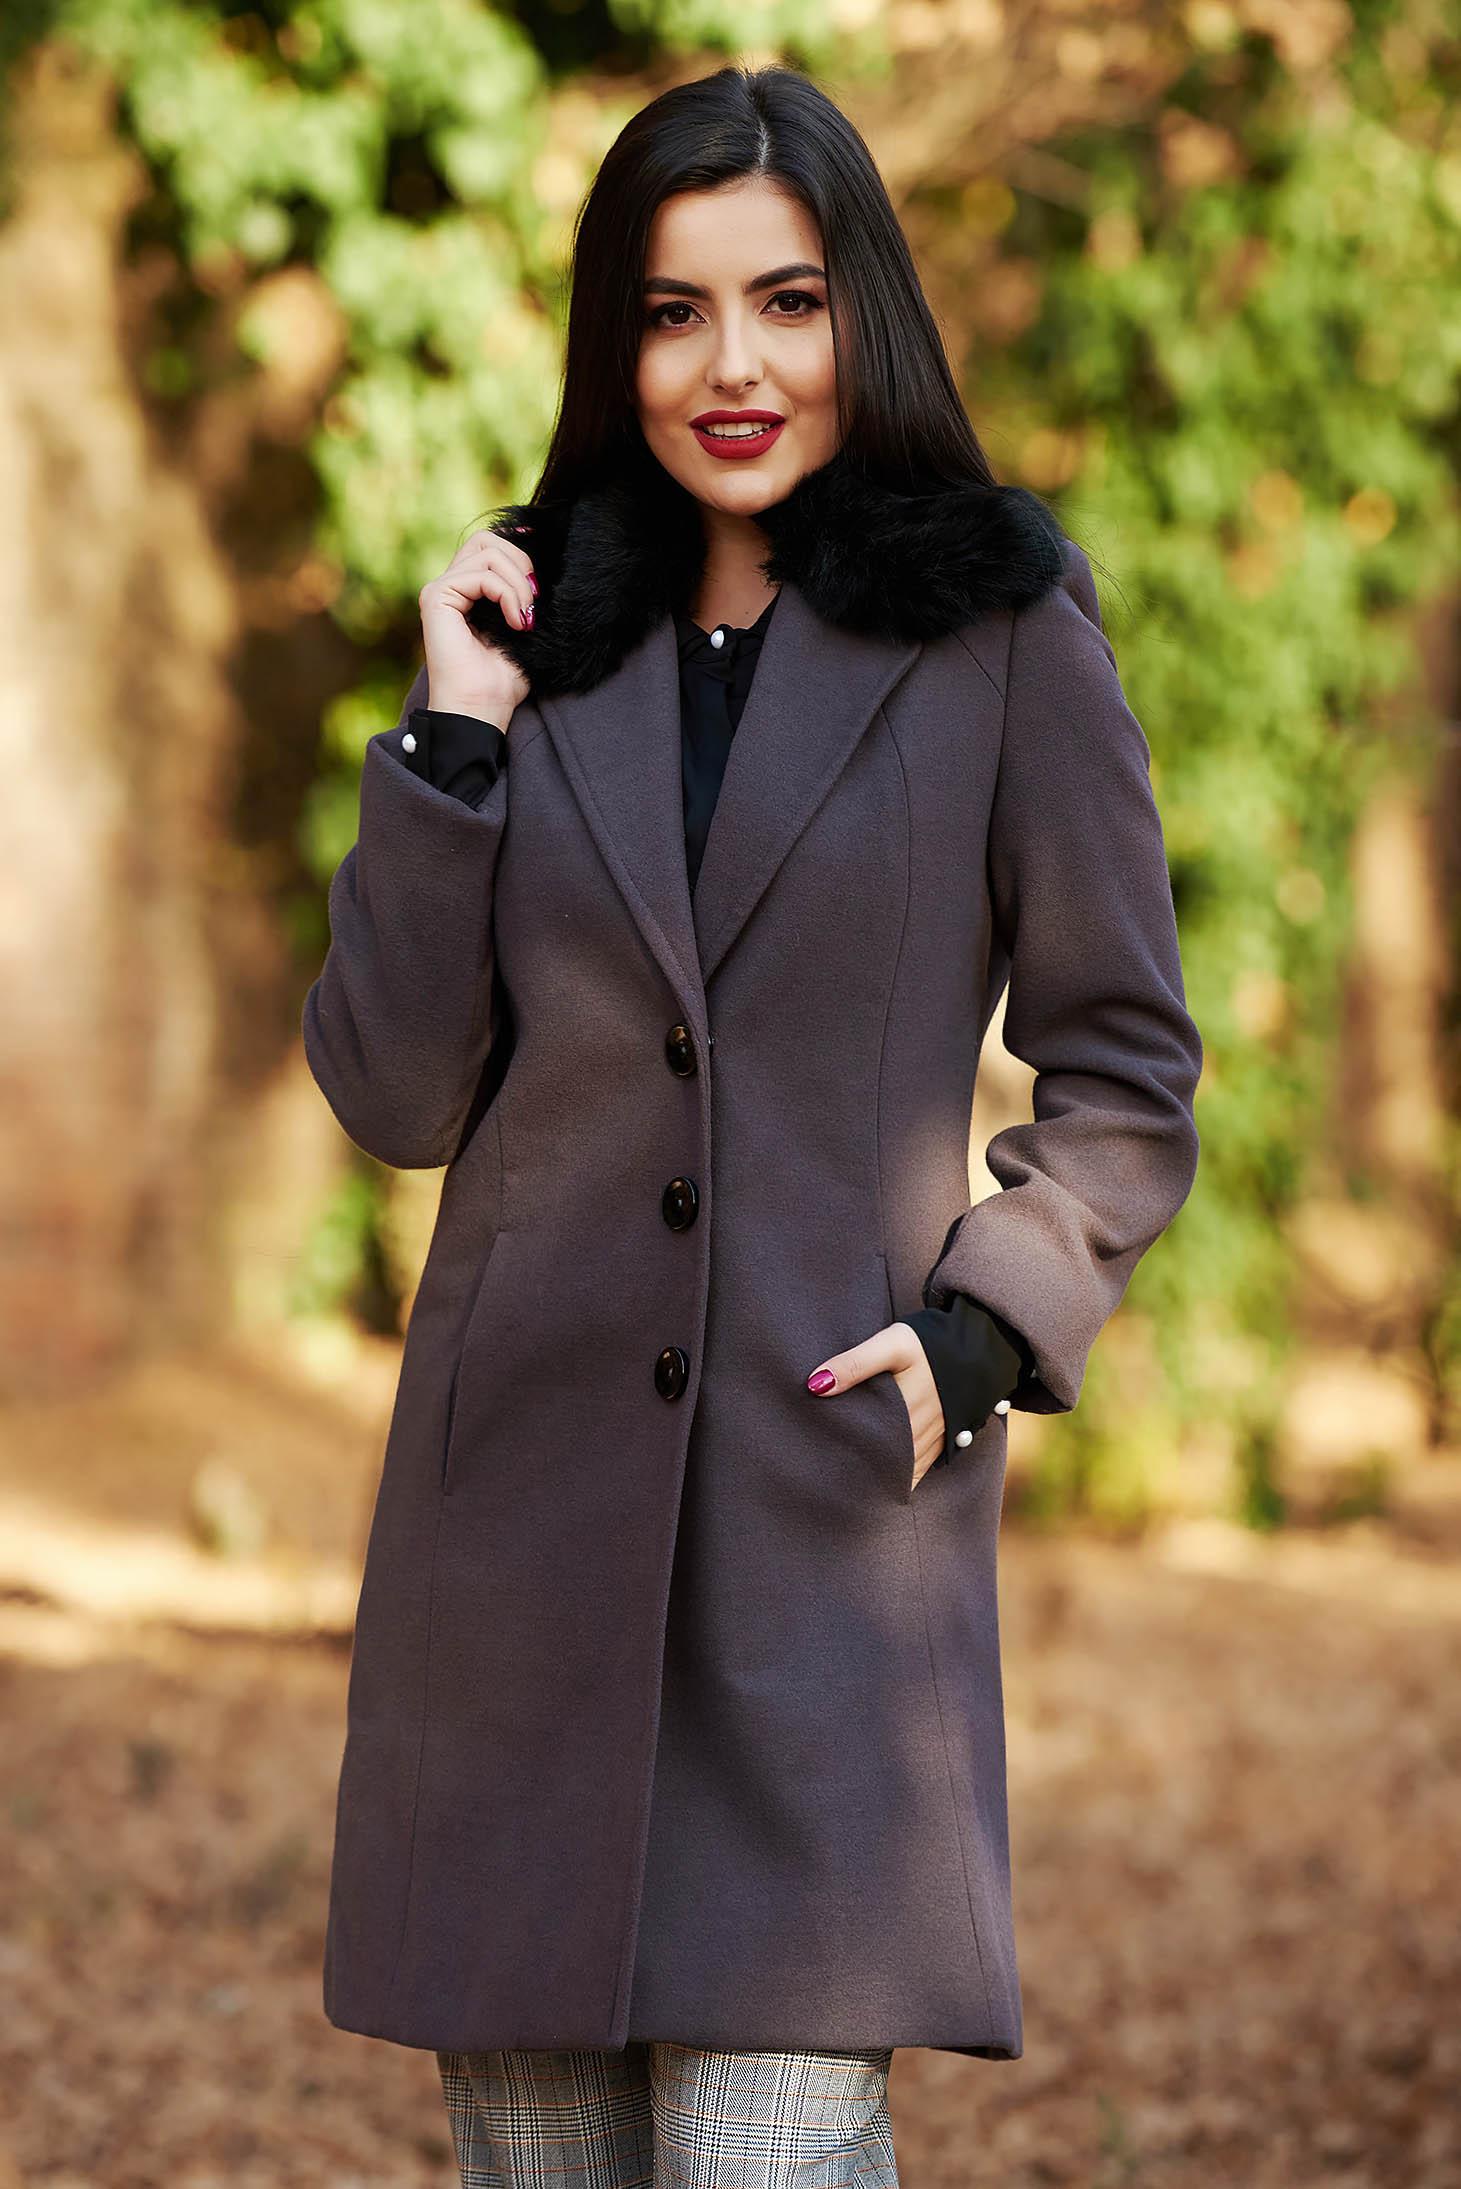 Palton StarShinerS gri-inchis elegant cu un croi cambrat din lana captusit pe interior cu guler din blana